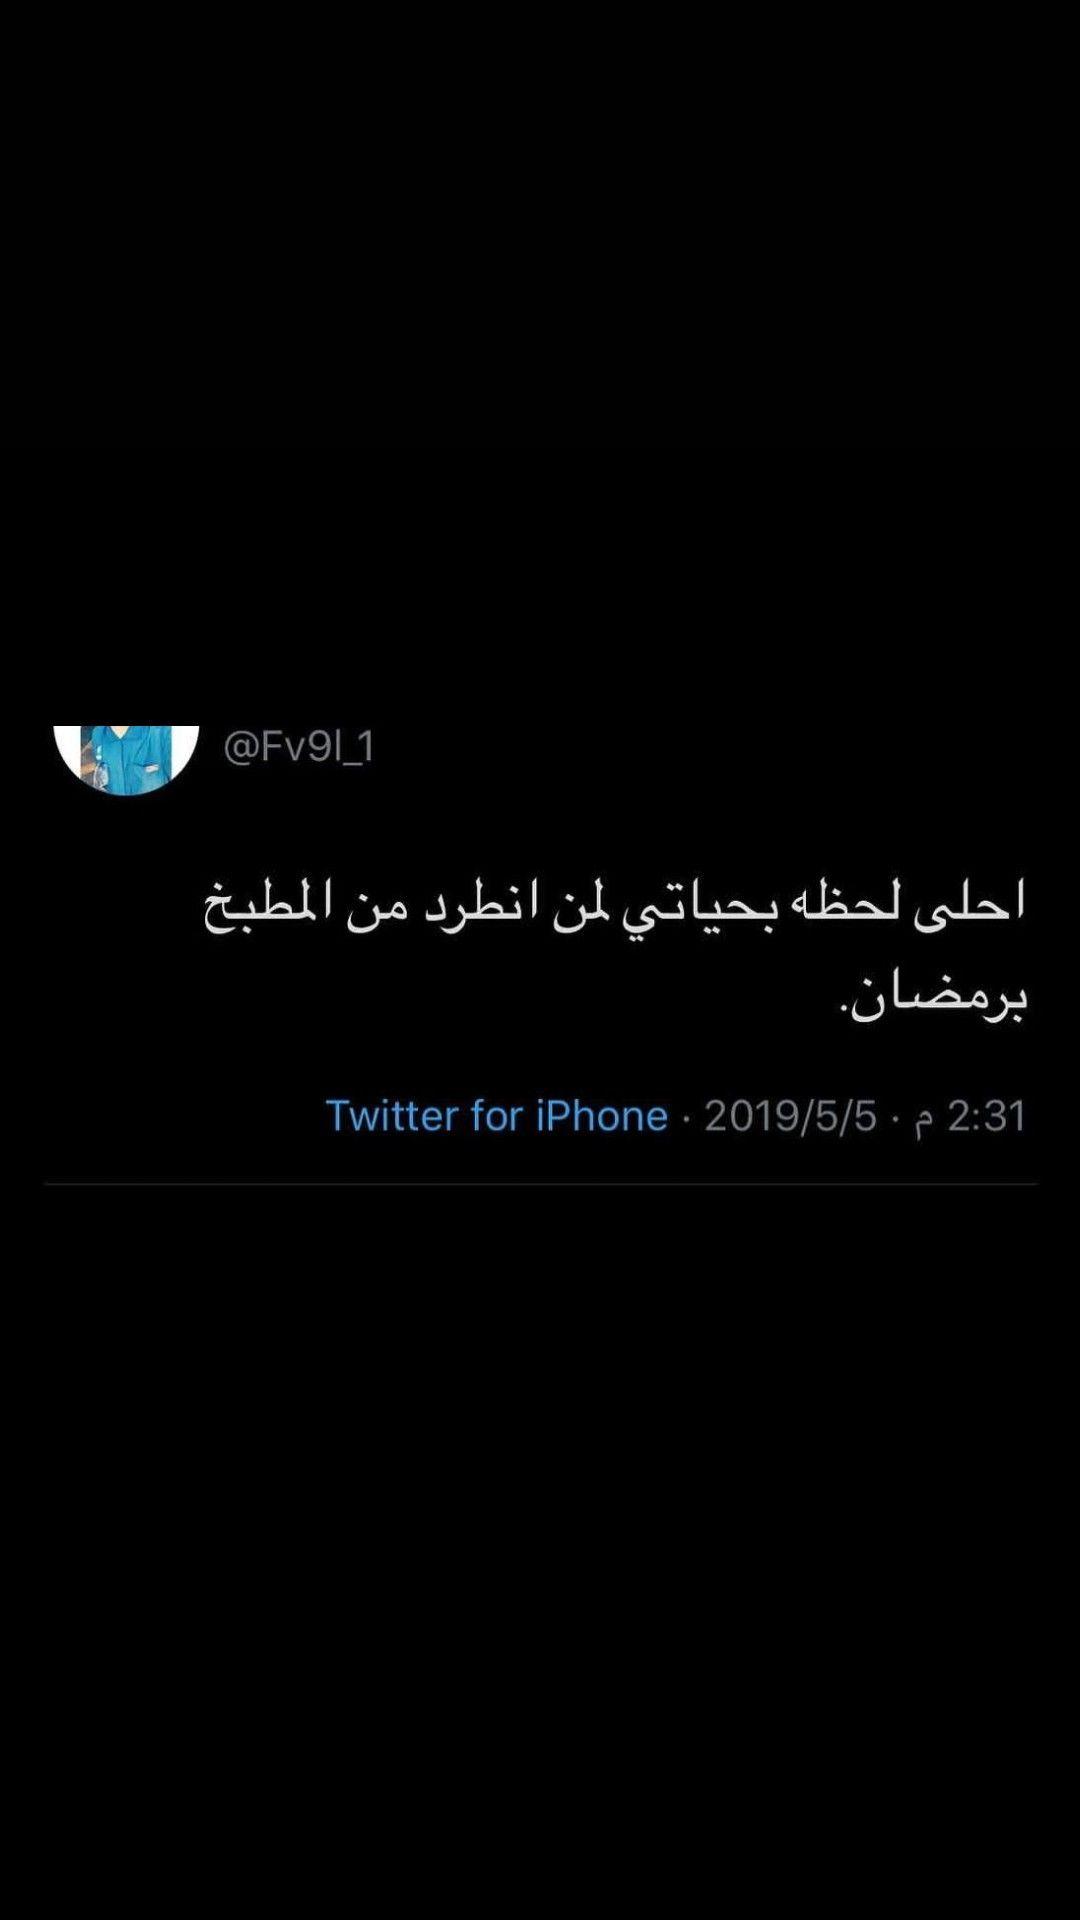 Pin By Elfxo L On نكت مضحكه Funny Arabic Quotes Arabic Funny Arabic Jokes